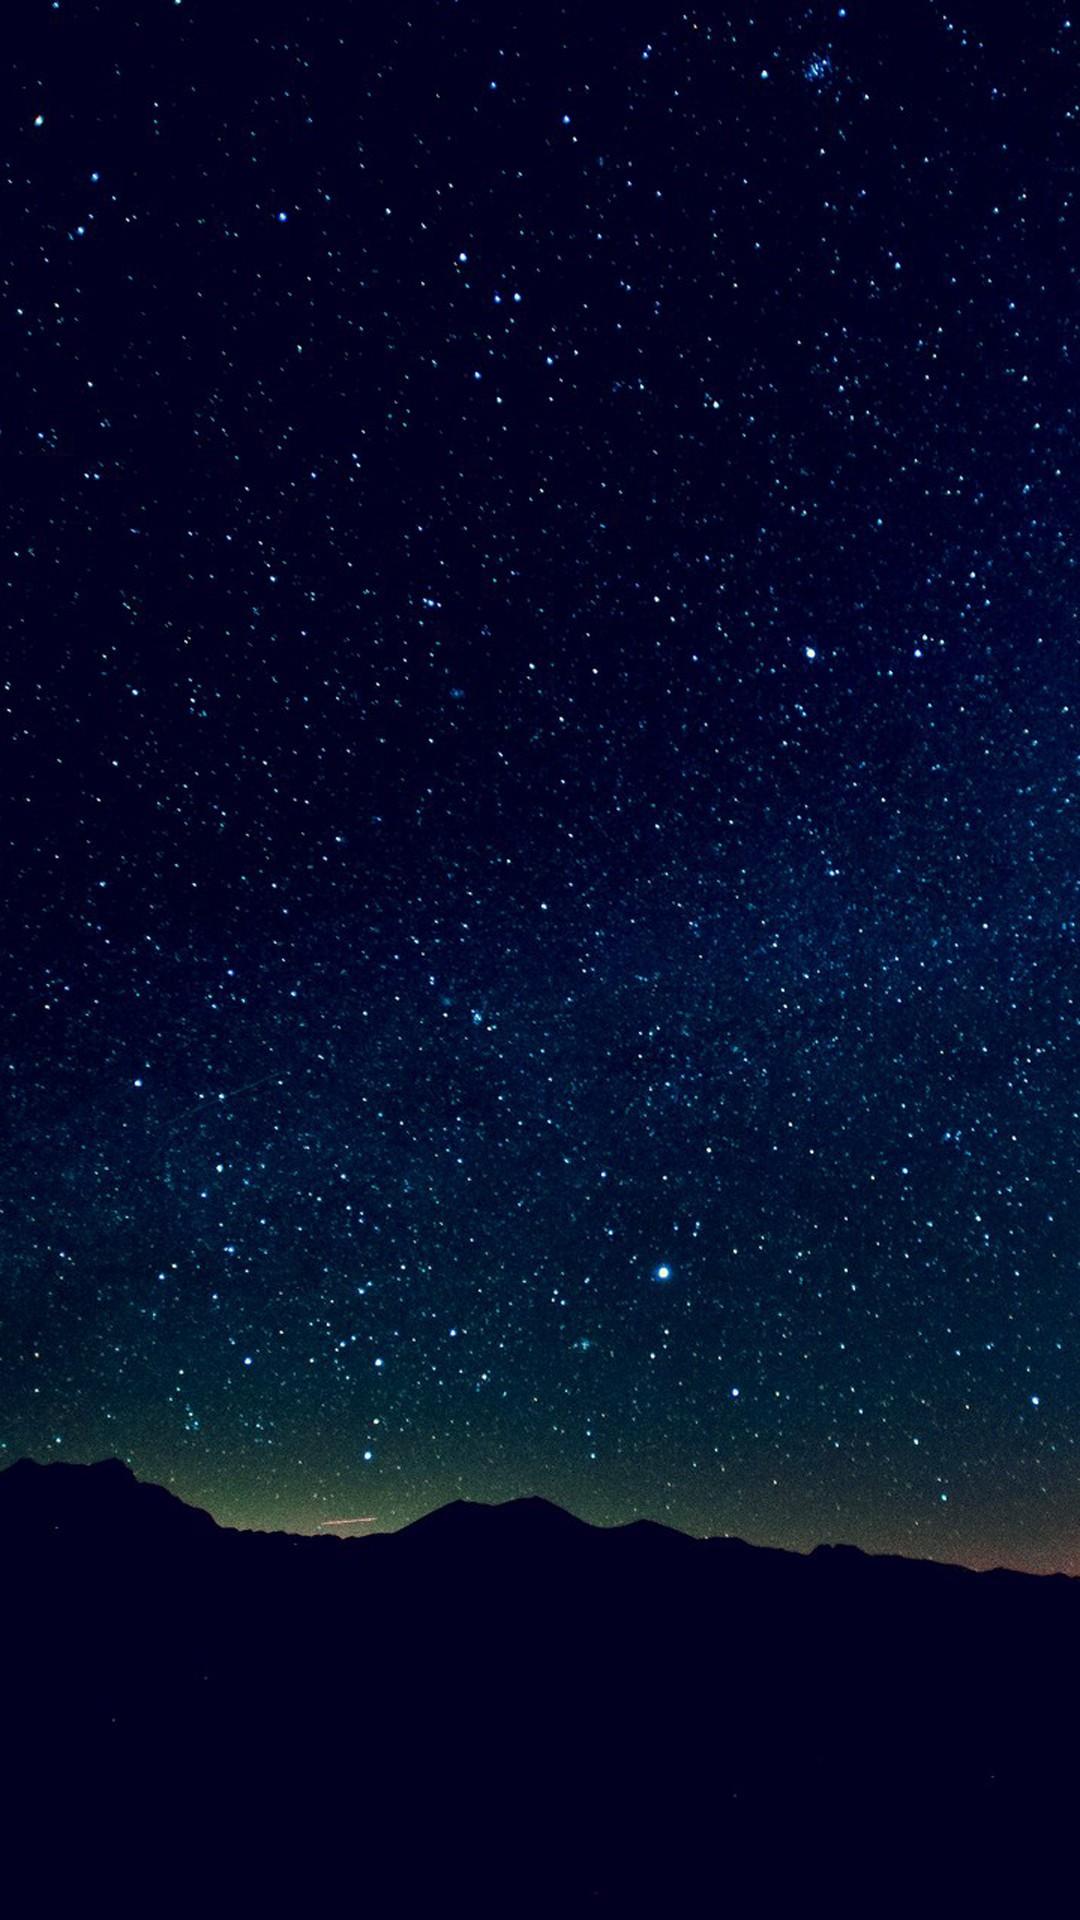 сам картинки звезды на небе на смартфон любим свою работу